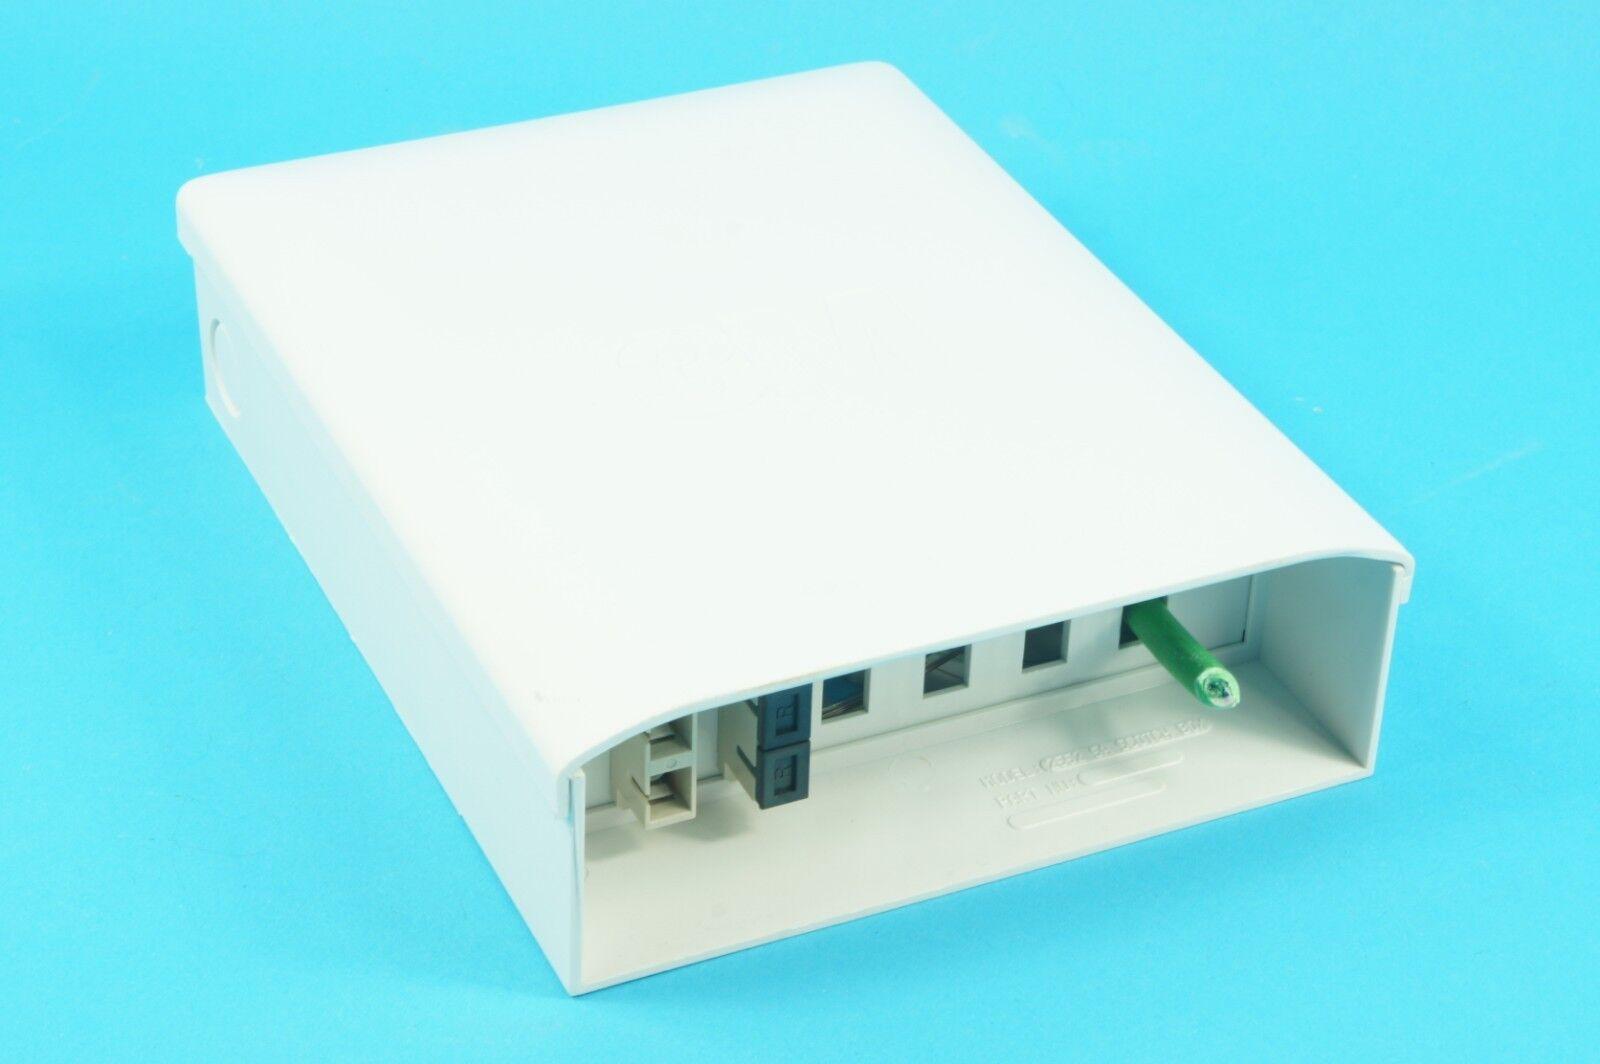 3M Scotch Box Fiber Wall outlet 2552SA